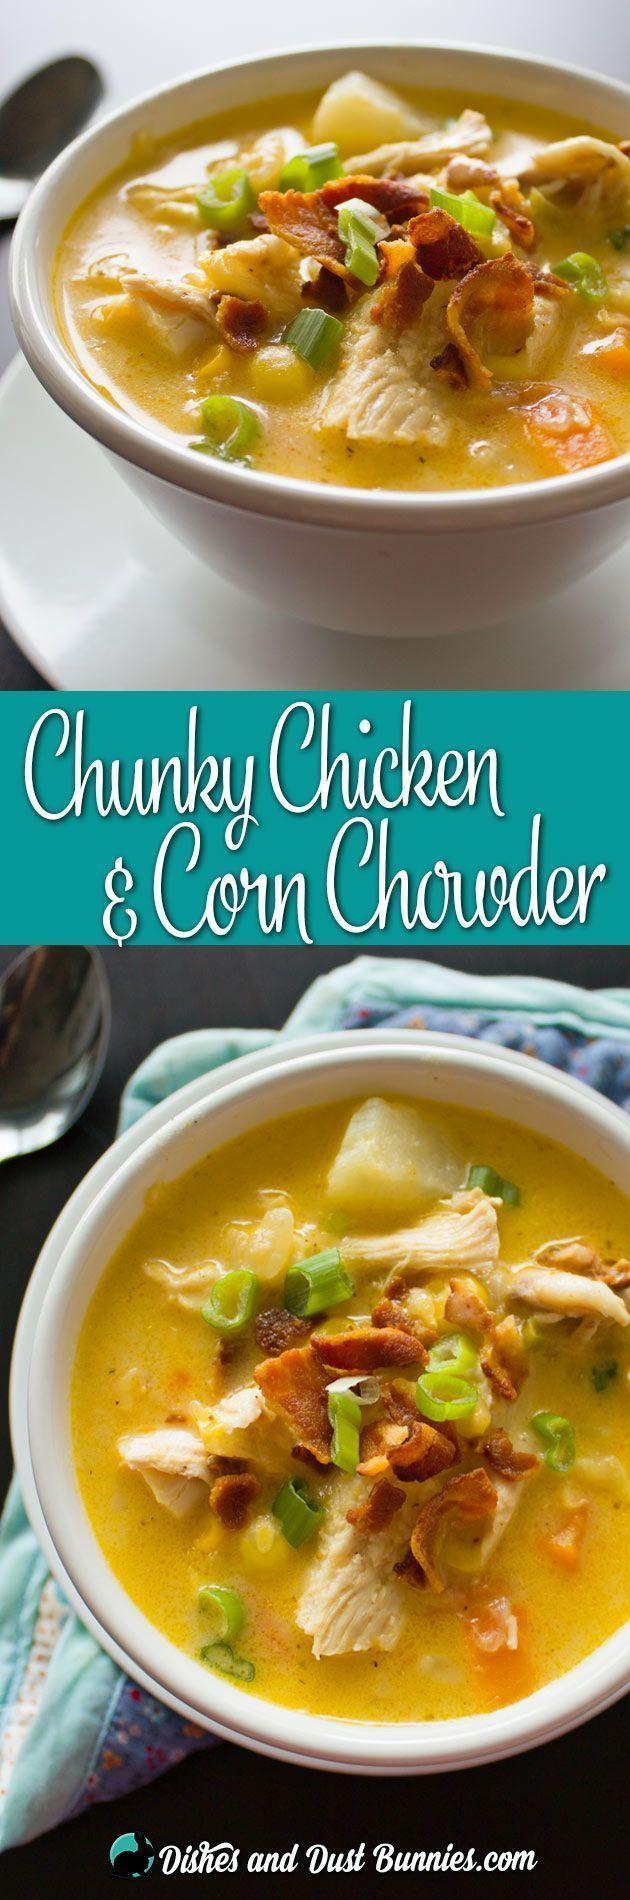 Chicken & Corn Chowder with Bacon from http://dishesanddustbunnies.com